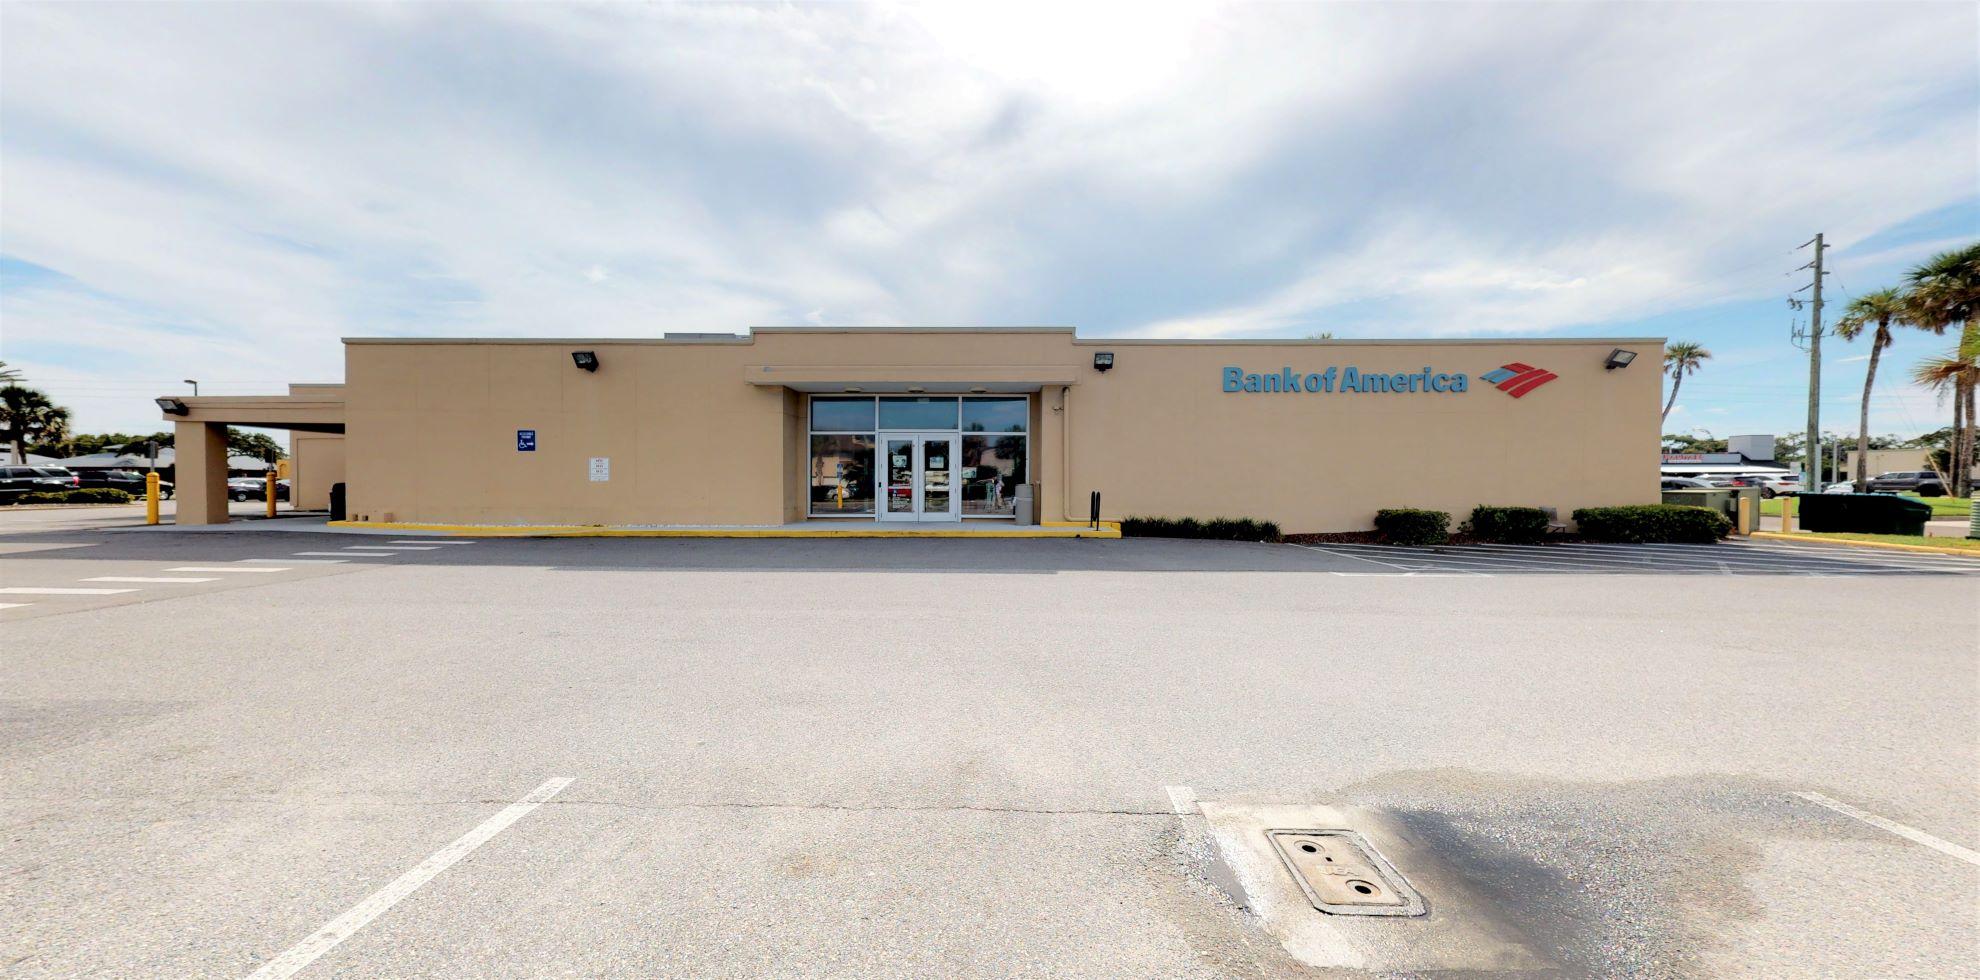 Bank of America financial center with drive-thru ATM | 301 3rd St, Neptune Beach, FL 32266